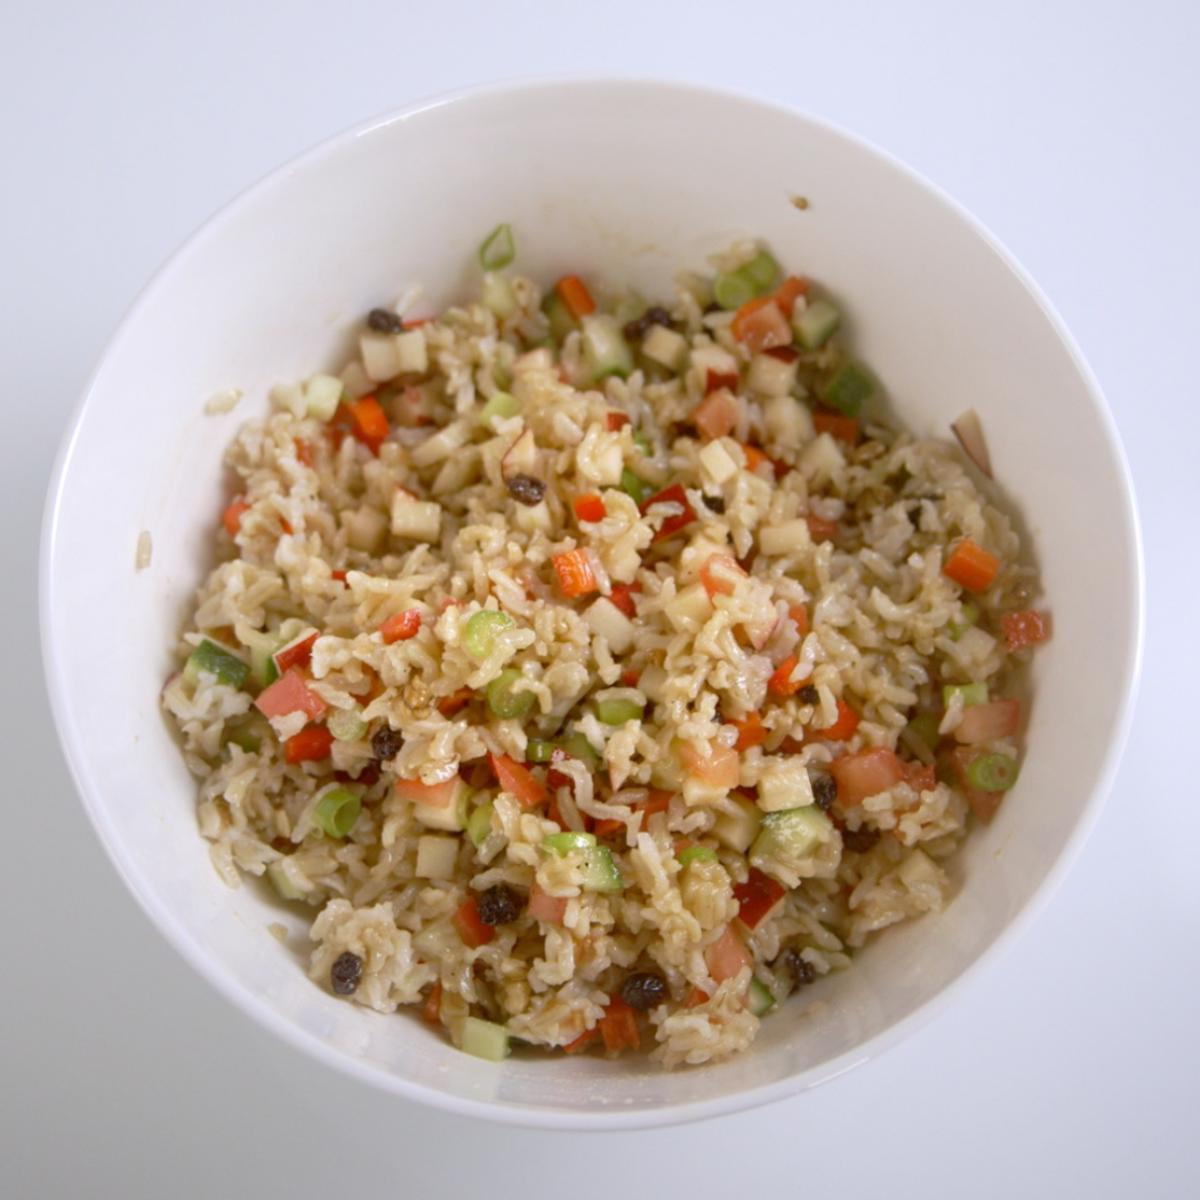 A picture of Delia's Brown Rice Salad recipe